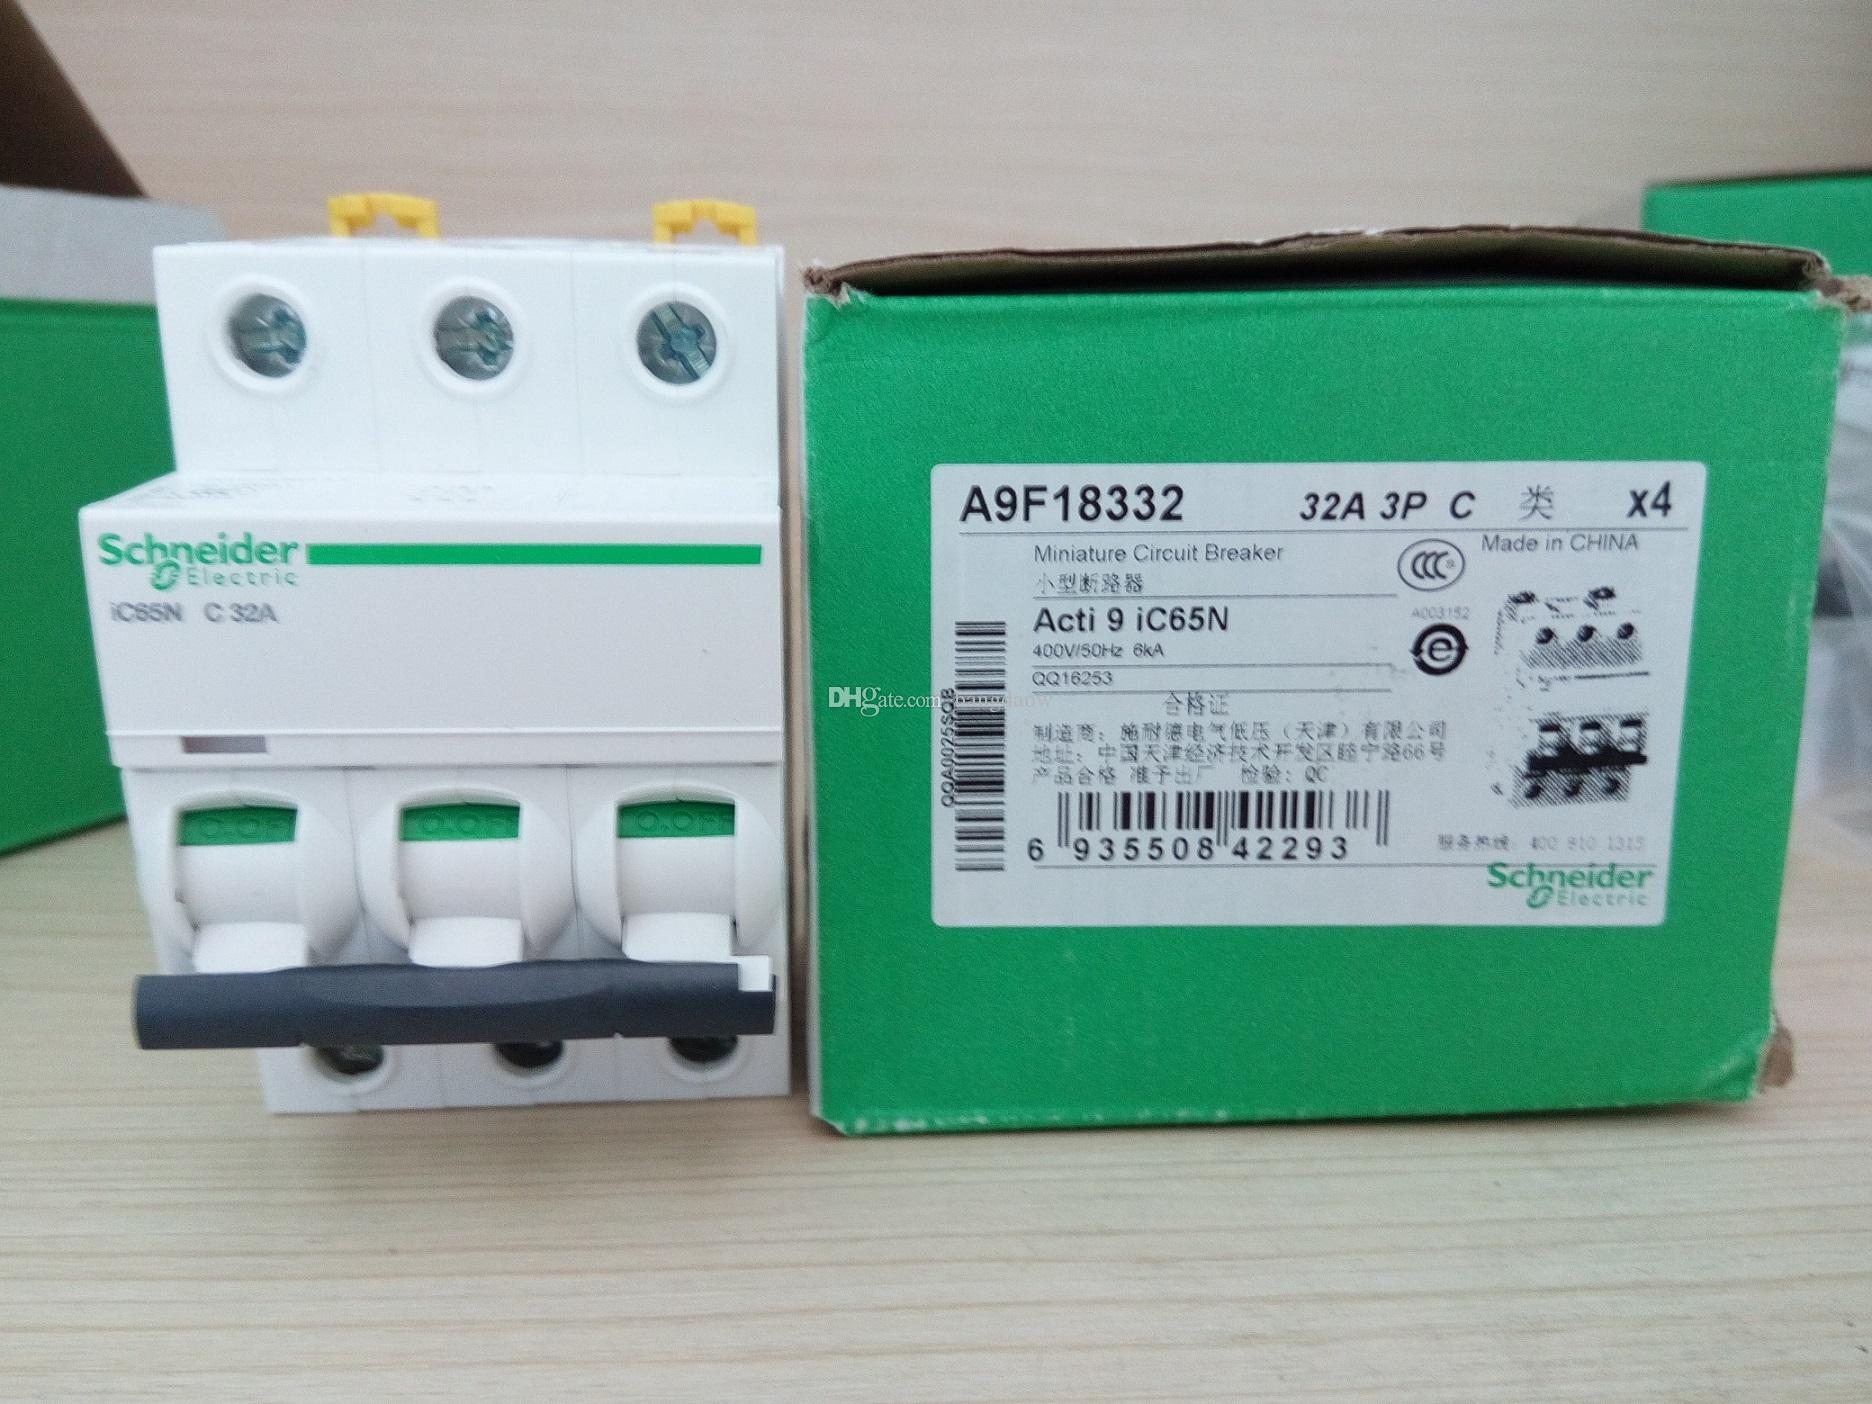 2018 Schneider Ic60n Miniature Circuit Breaker Acti9 Ic65n C32a 3p China Box From Bangdaow 1609